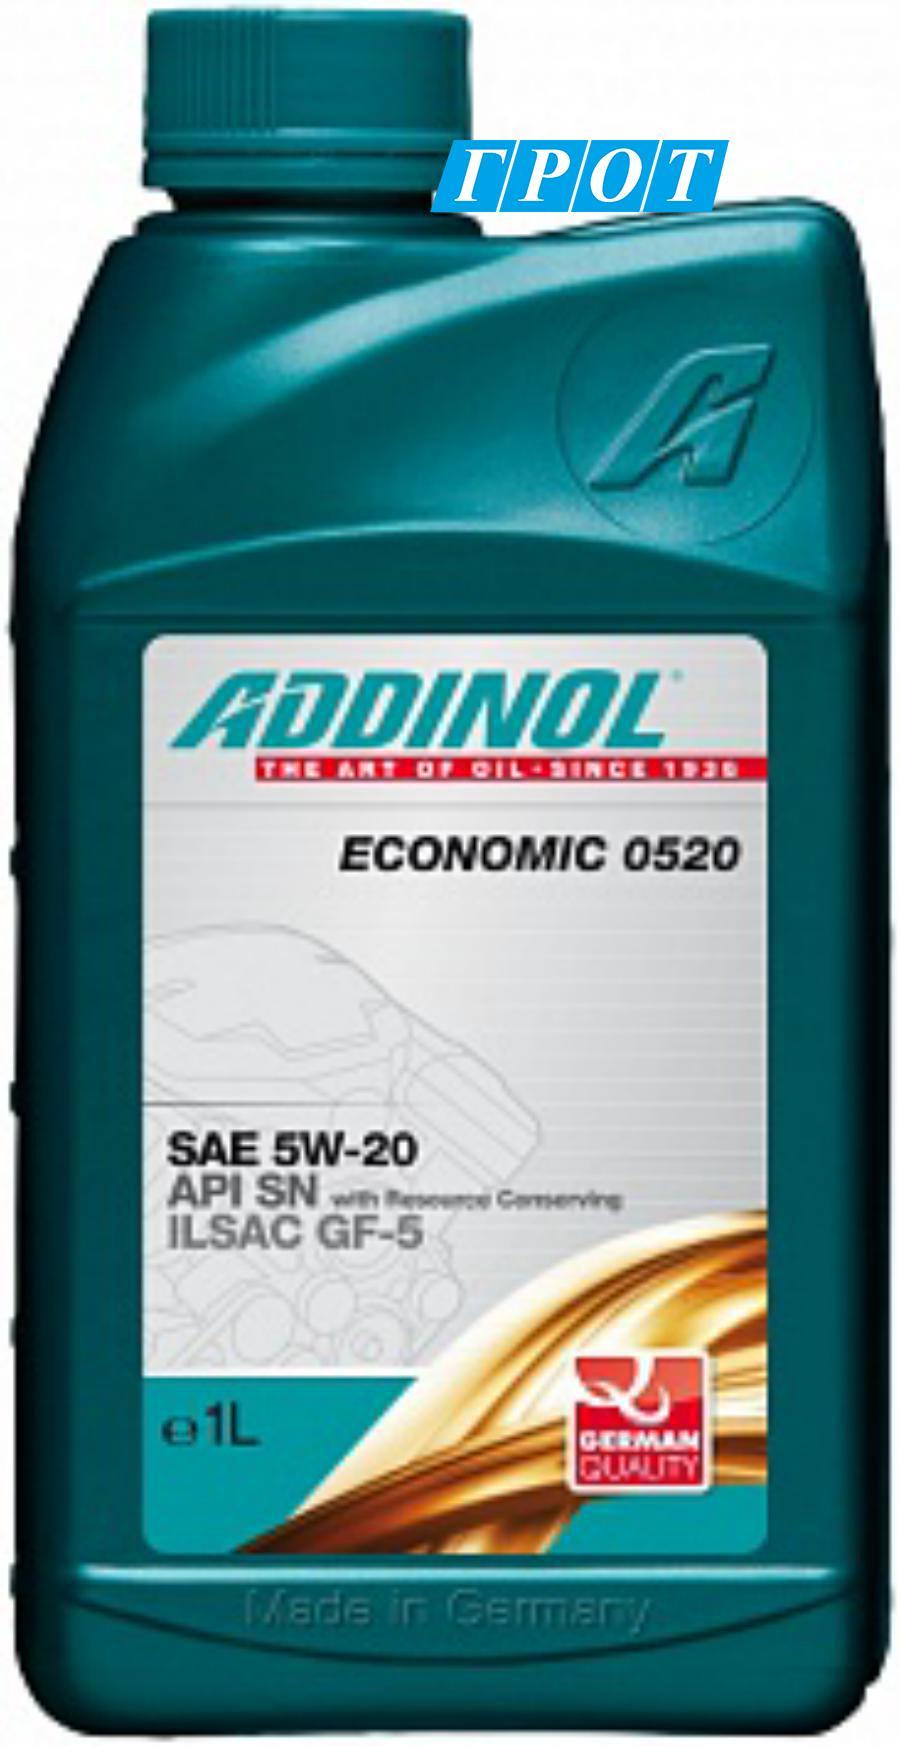 Масло моторное синтетическое Economic 0520 5W-20, 1л